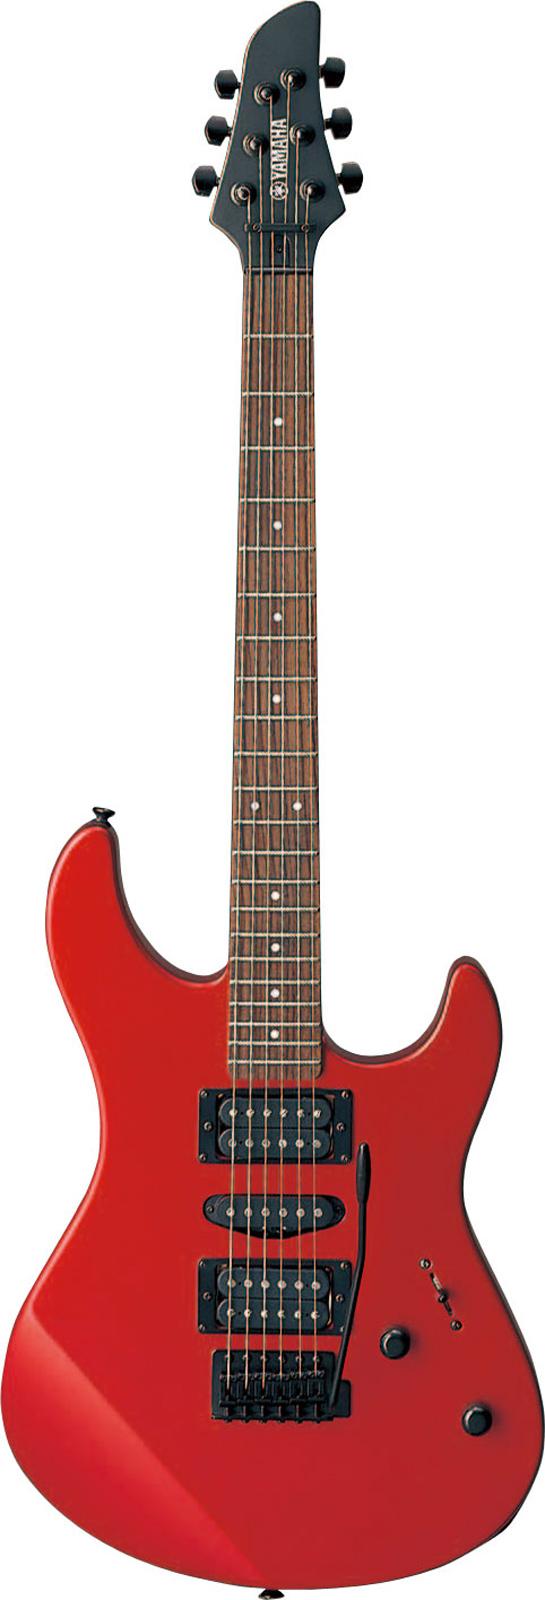 Yamaha Rgx121zrm Red Metallic